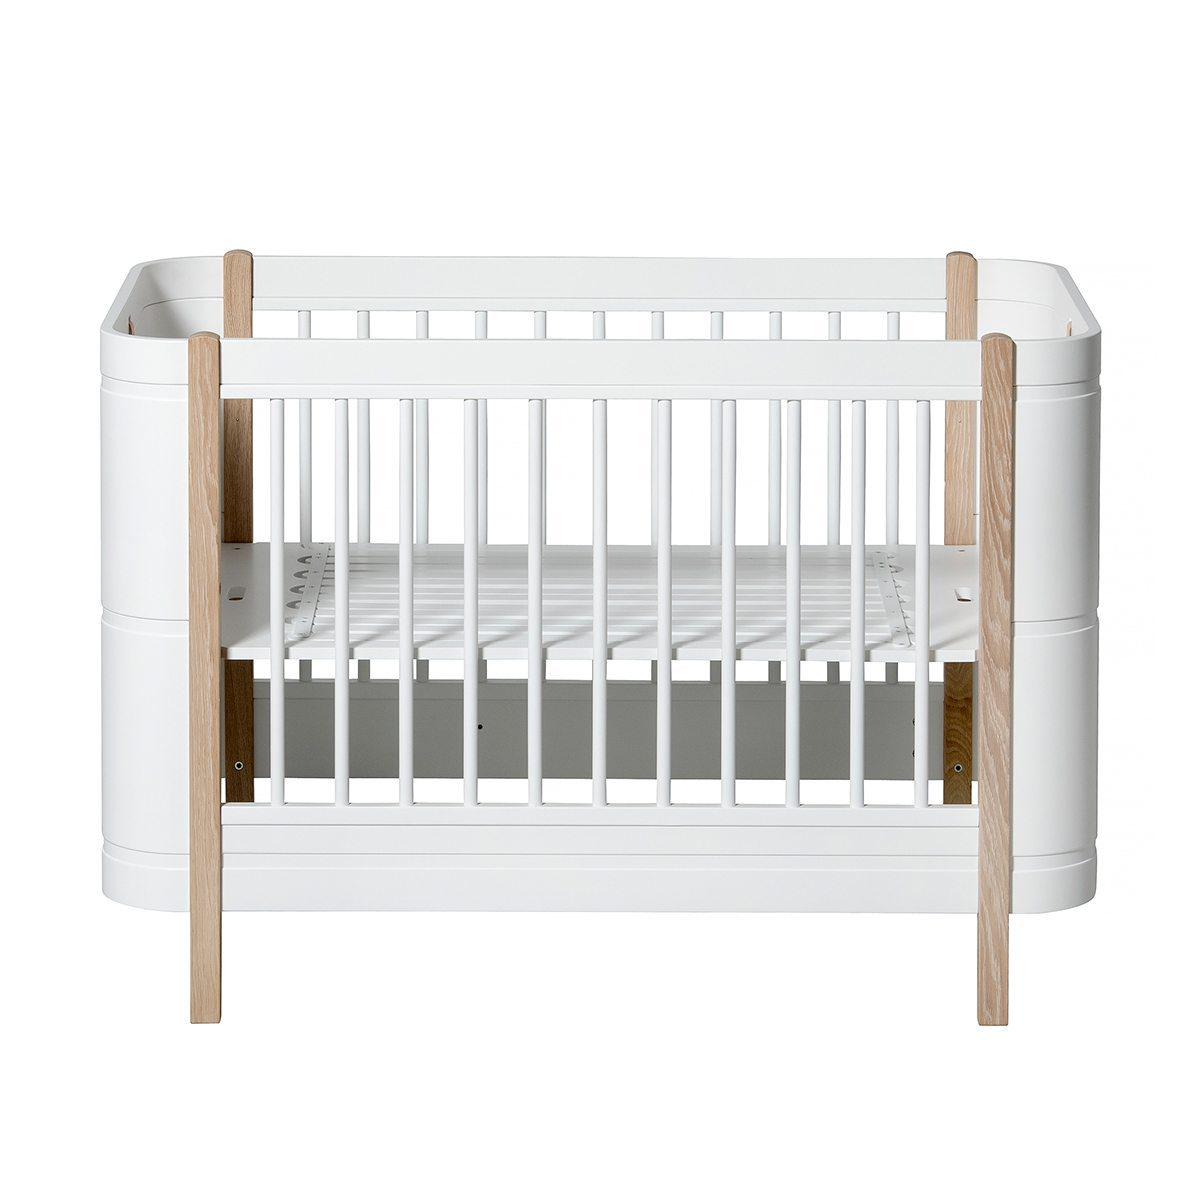 Oliver Furniture – Wood Mini+ Basic Ledikant – Wit/Eikenhout